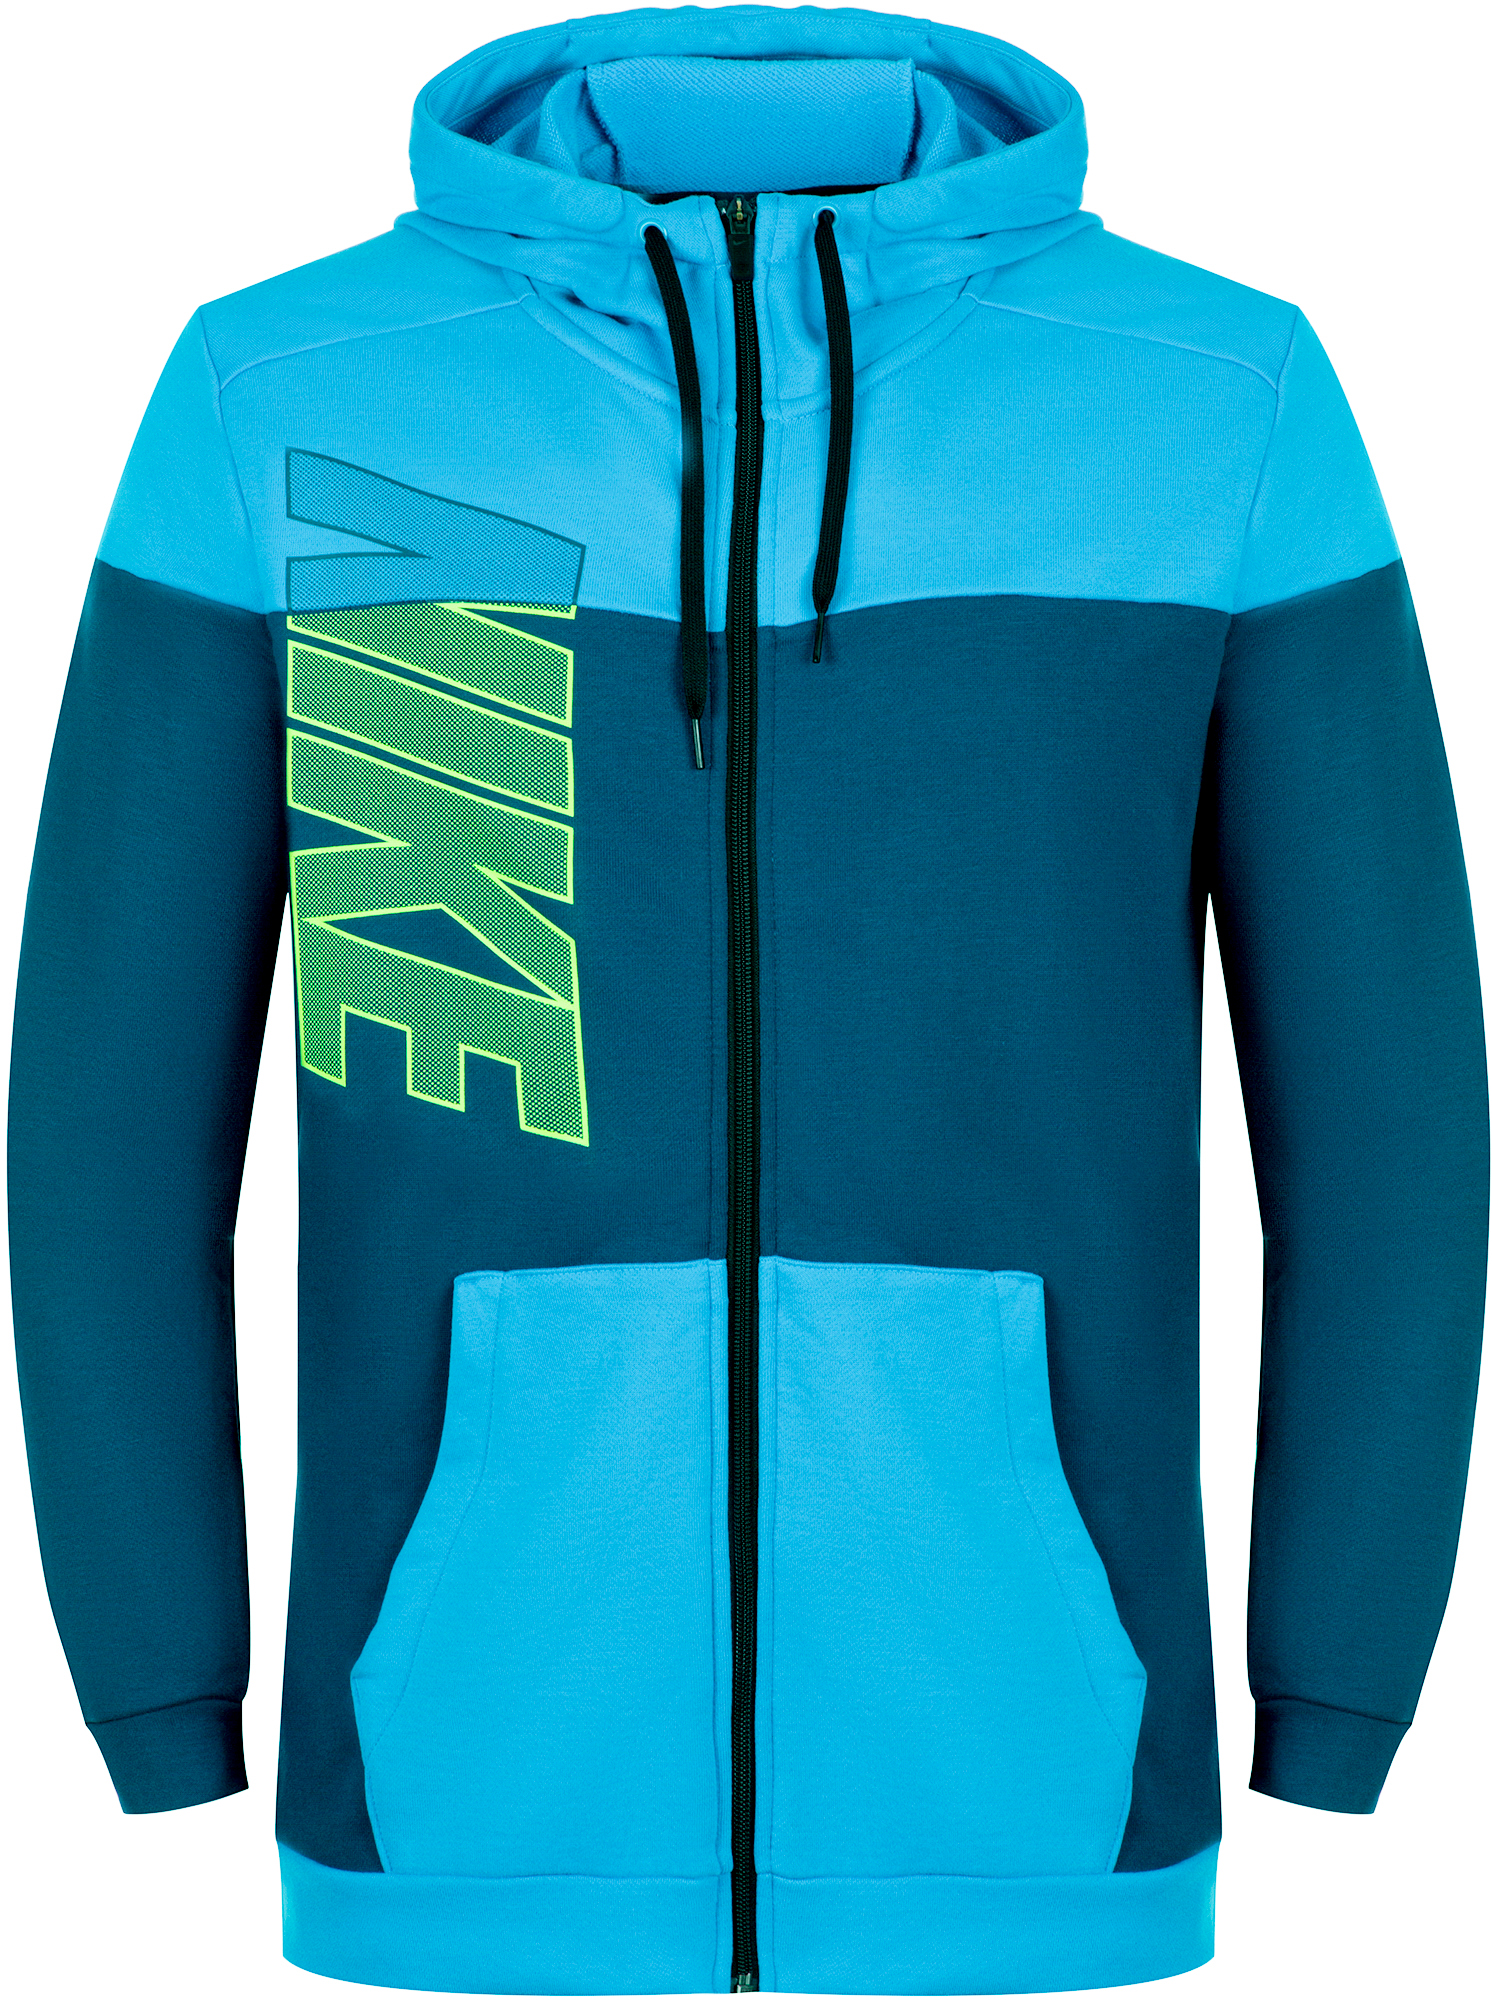 Nike Толстовка мужская Nike Dri-FIT, размер 52-54 мужская толстовка 2015 slim fit w20